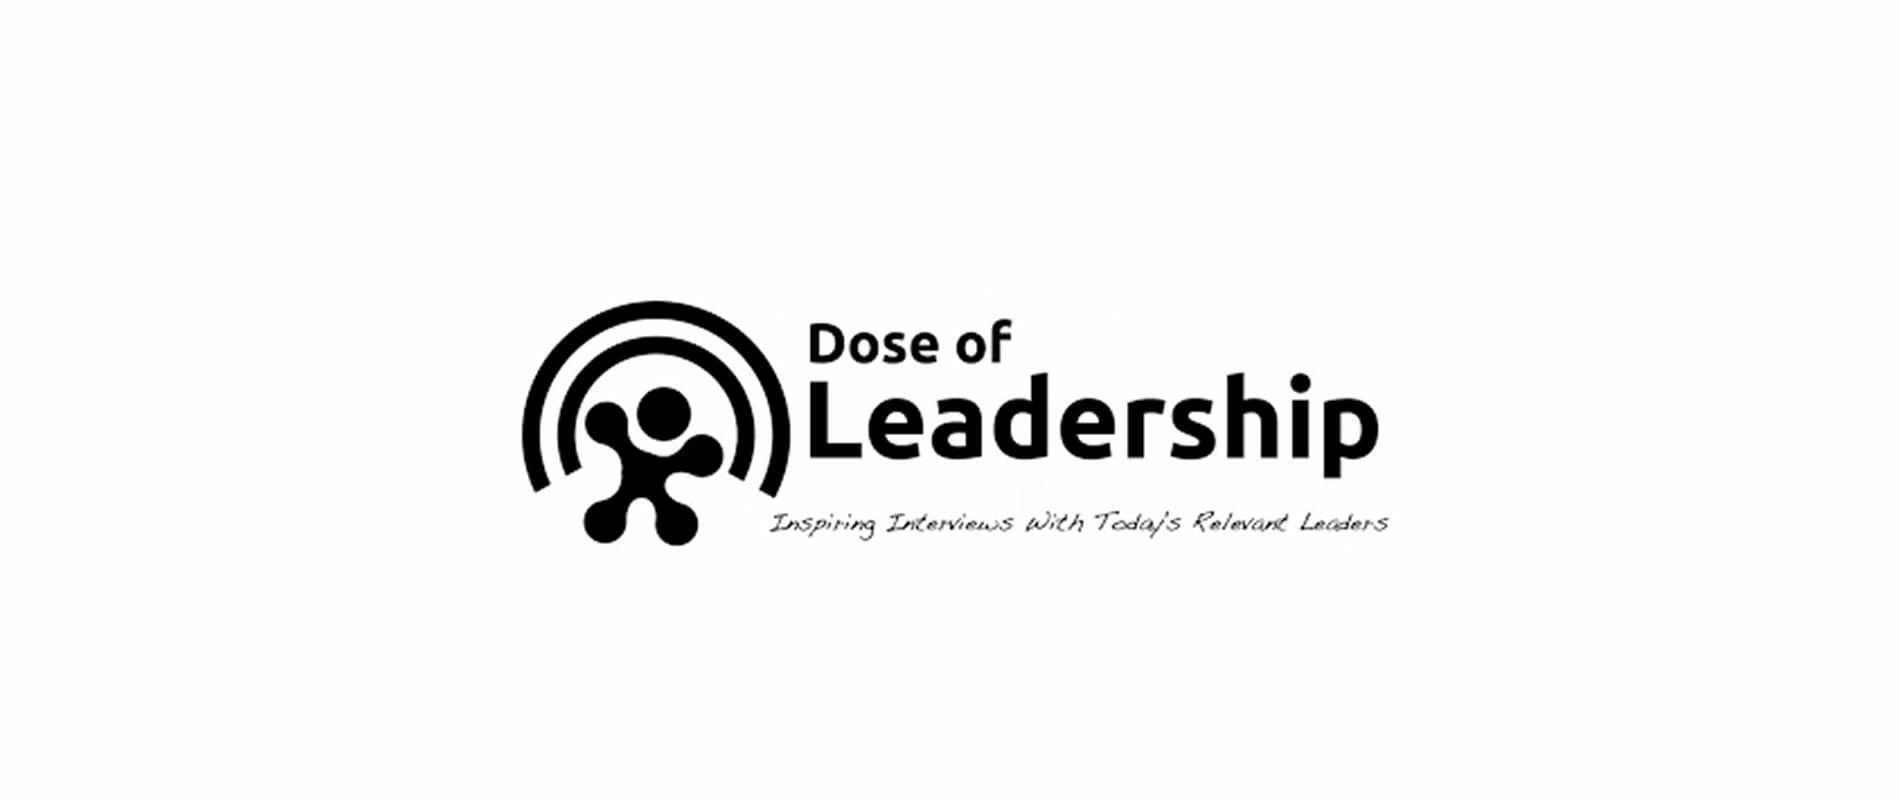 Dose of Leadership logo